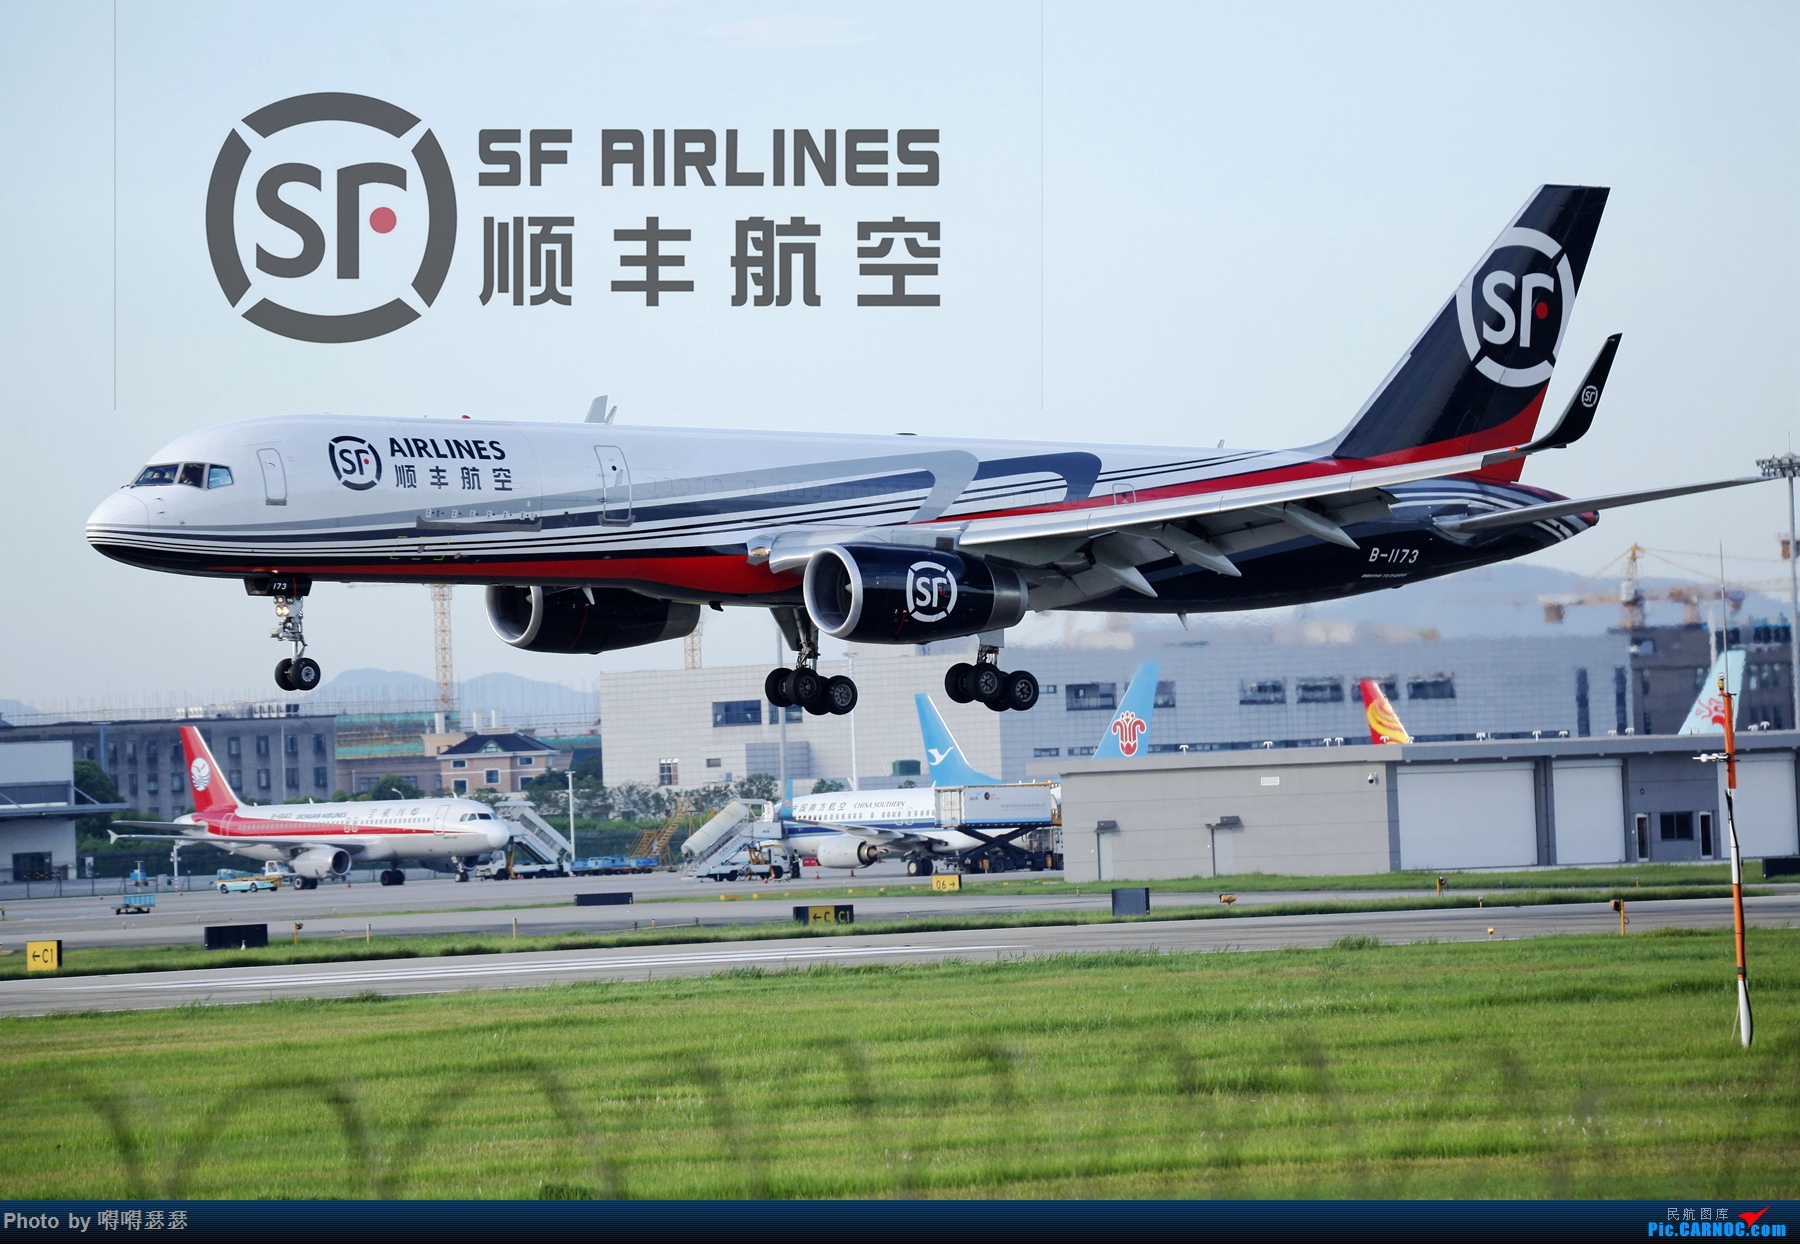 Re:[原创]账号被注销 BOEING 757-200F B-1173 中国杭州萧山国际机场